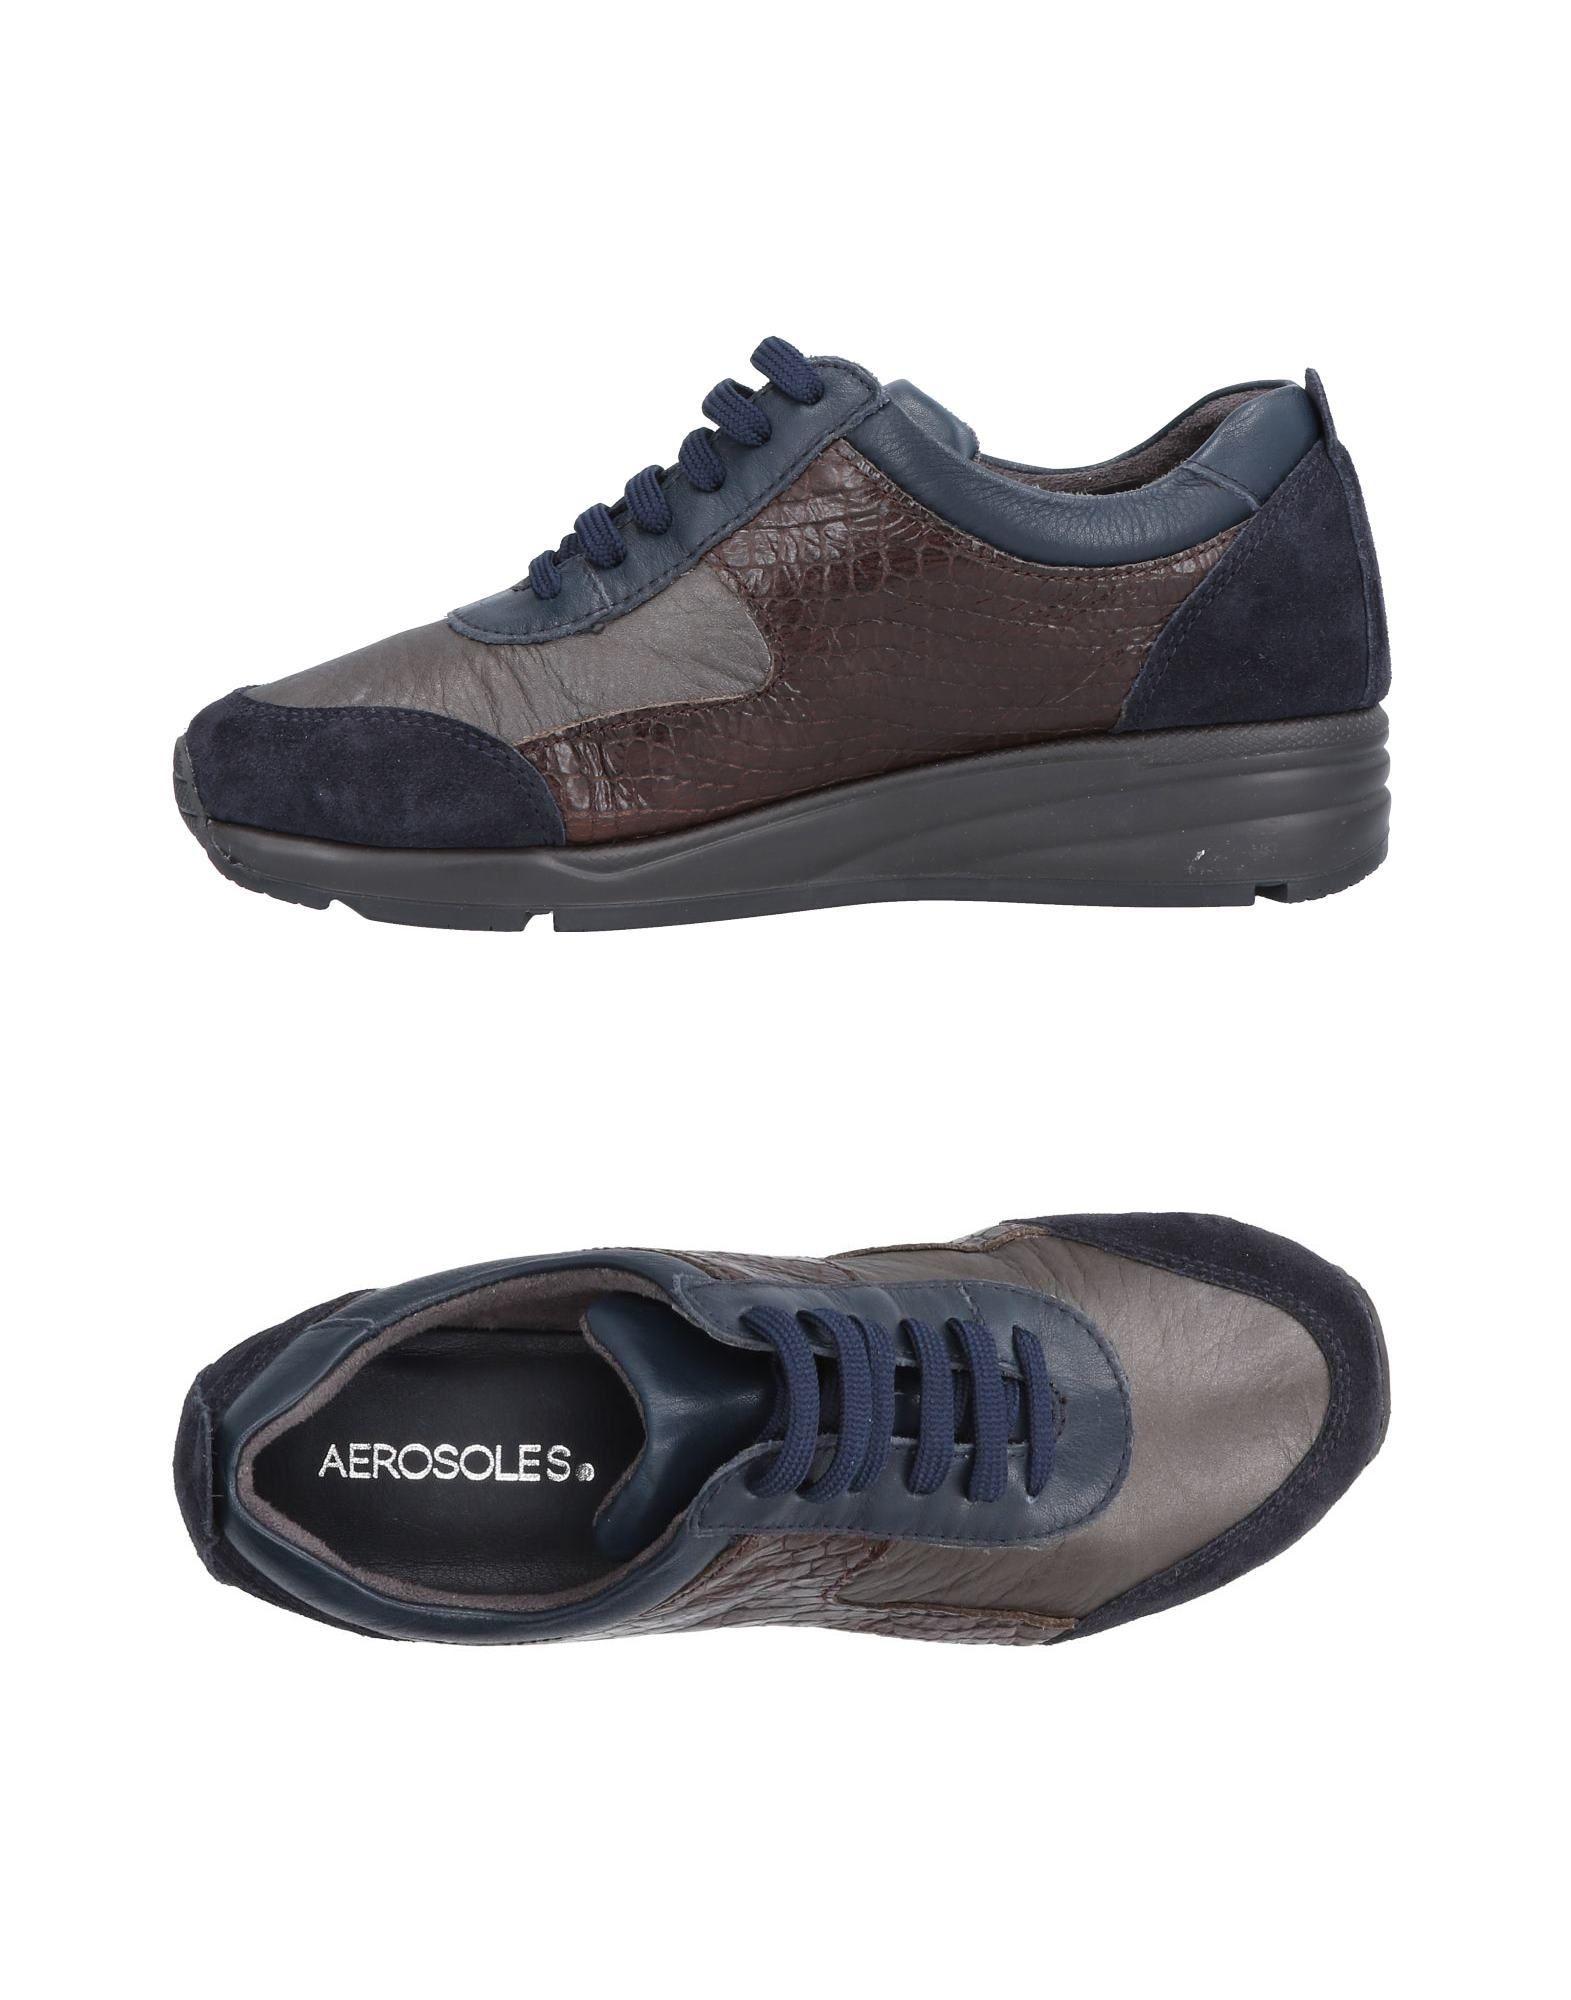 Aerosoles Sneakers Damen  11487468DD Gute Qualität beliebte Schuhe